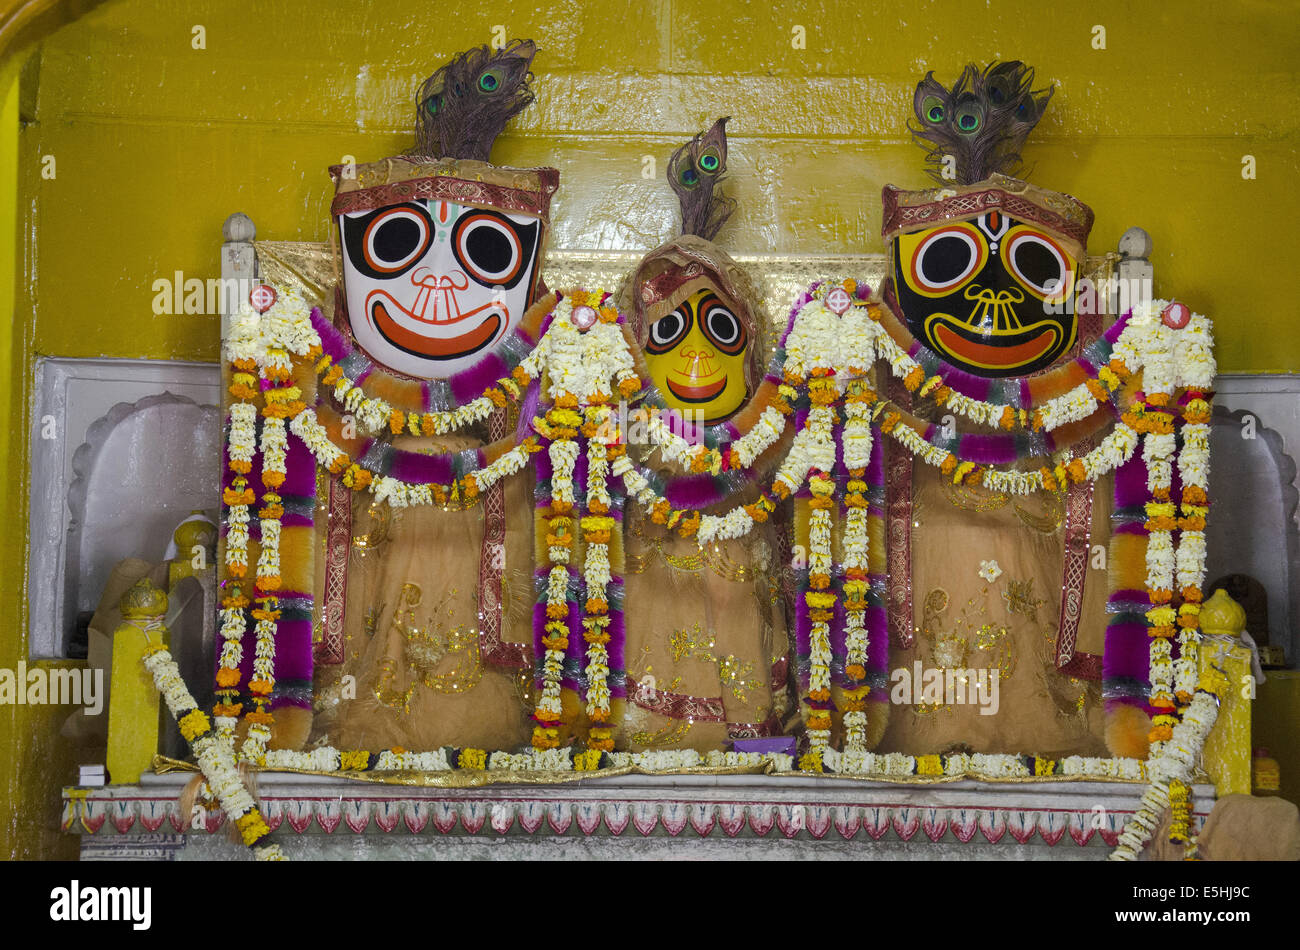 Most Inspiring Wallpaper Lord Jagannath Puri - temple-of-the-holy-triad-of-the-jagannath-temple-lord-jagannath-balabhadra-E5HJ9C  Pic_65649.jpg